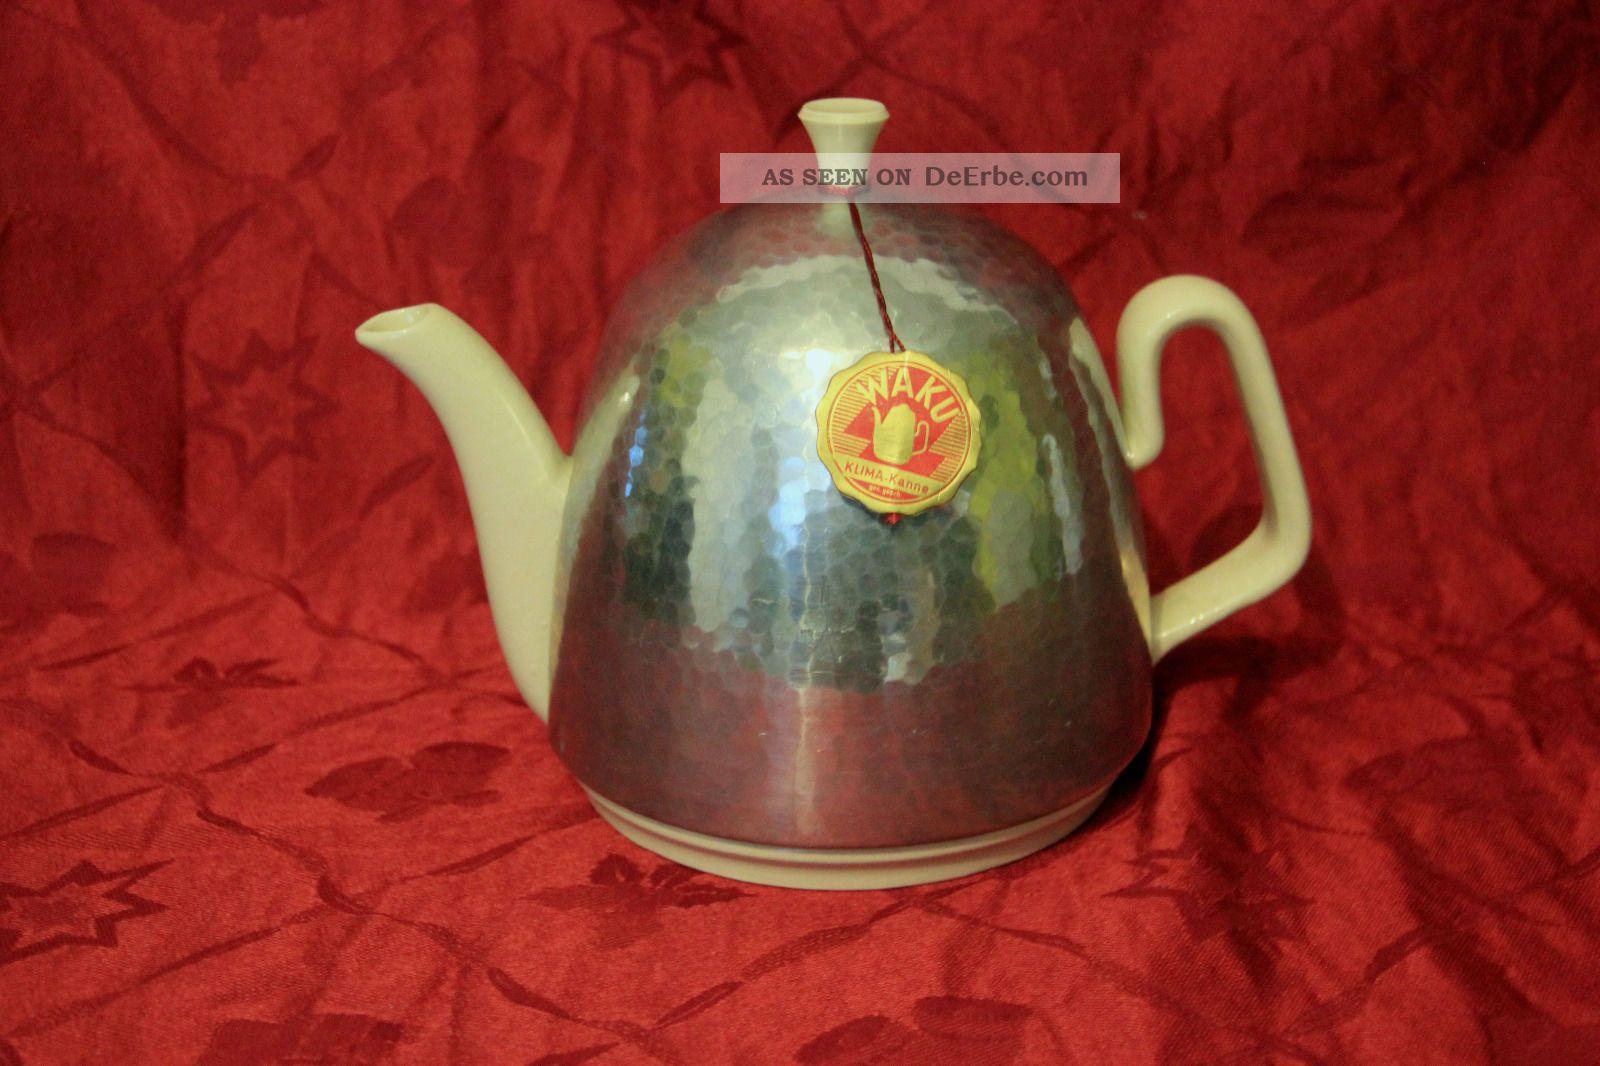 Waku Thermokanne Kaffee/teekanne Mit Haube 50er Jahre 1 Ltr. 1950-1959 Bild